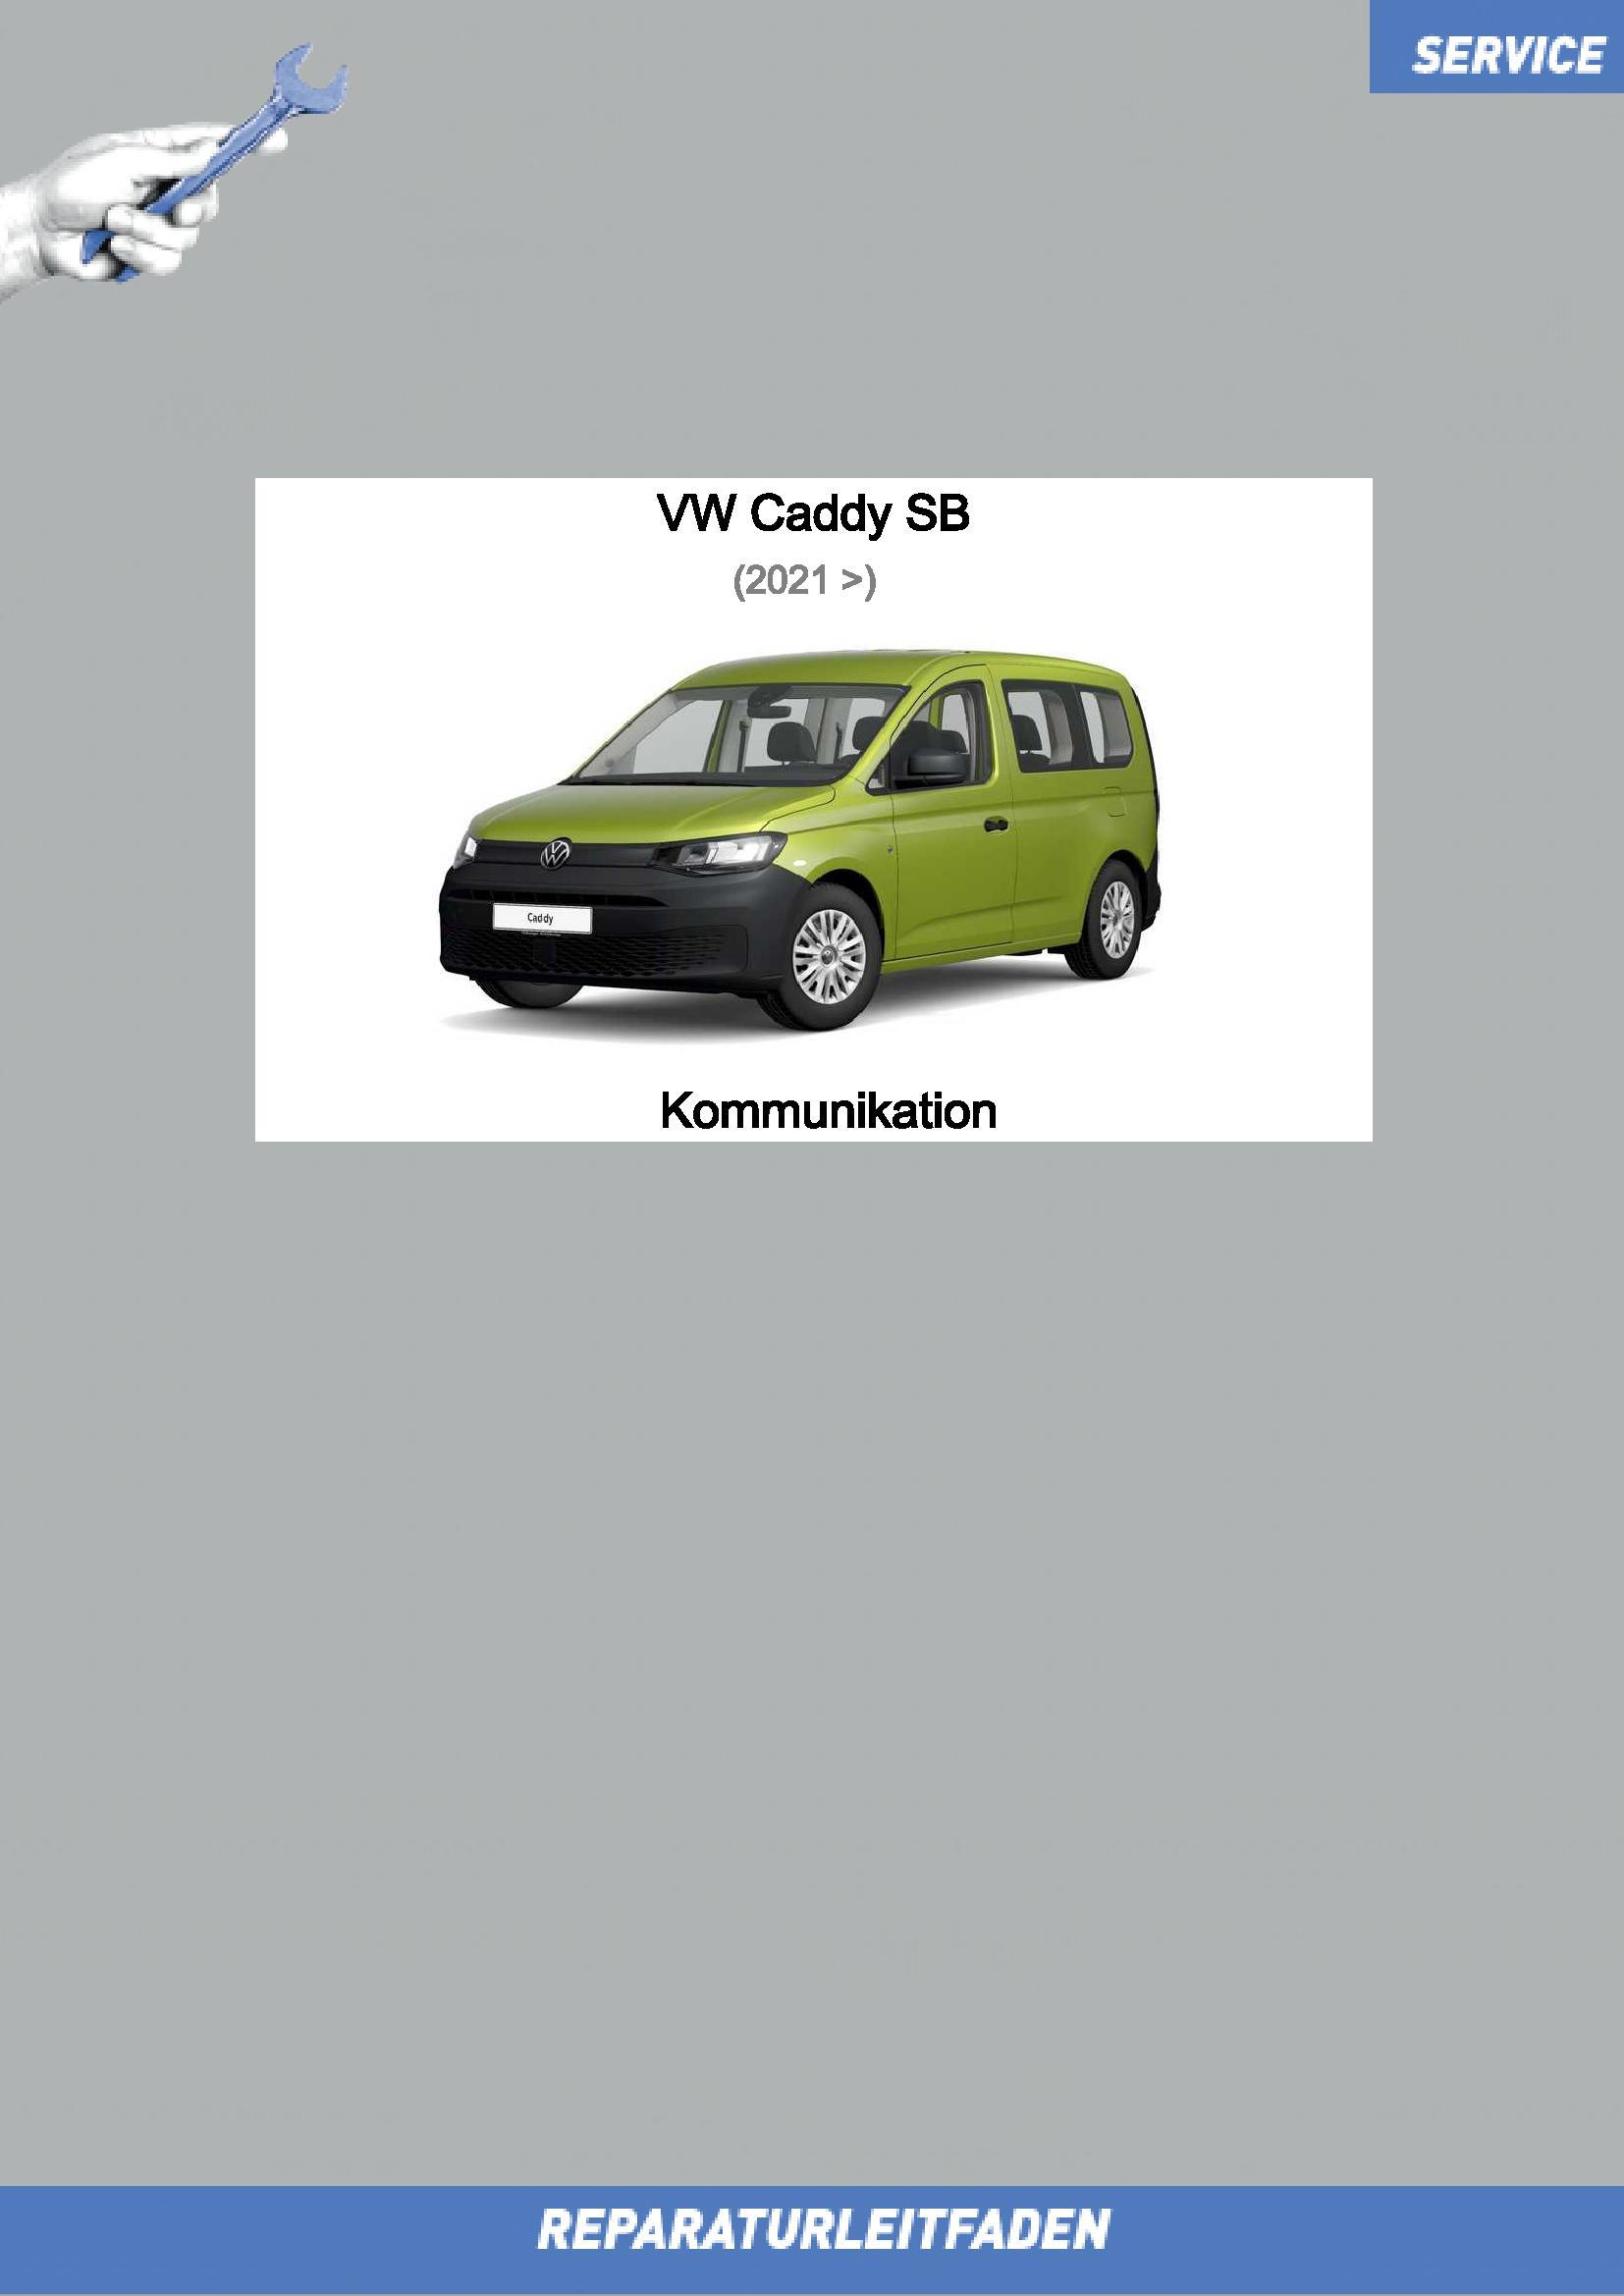 vw-caddy-sb-0011-kommunikation_1.png